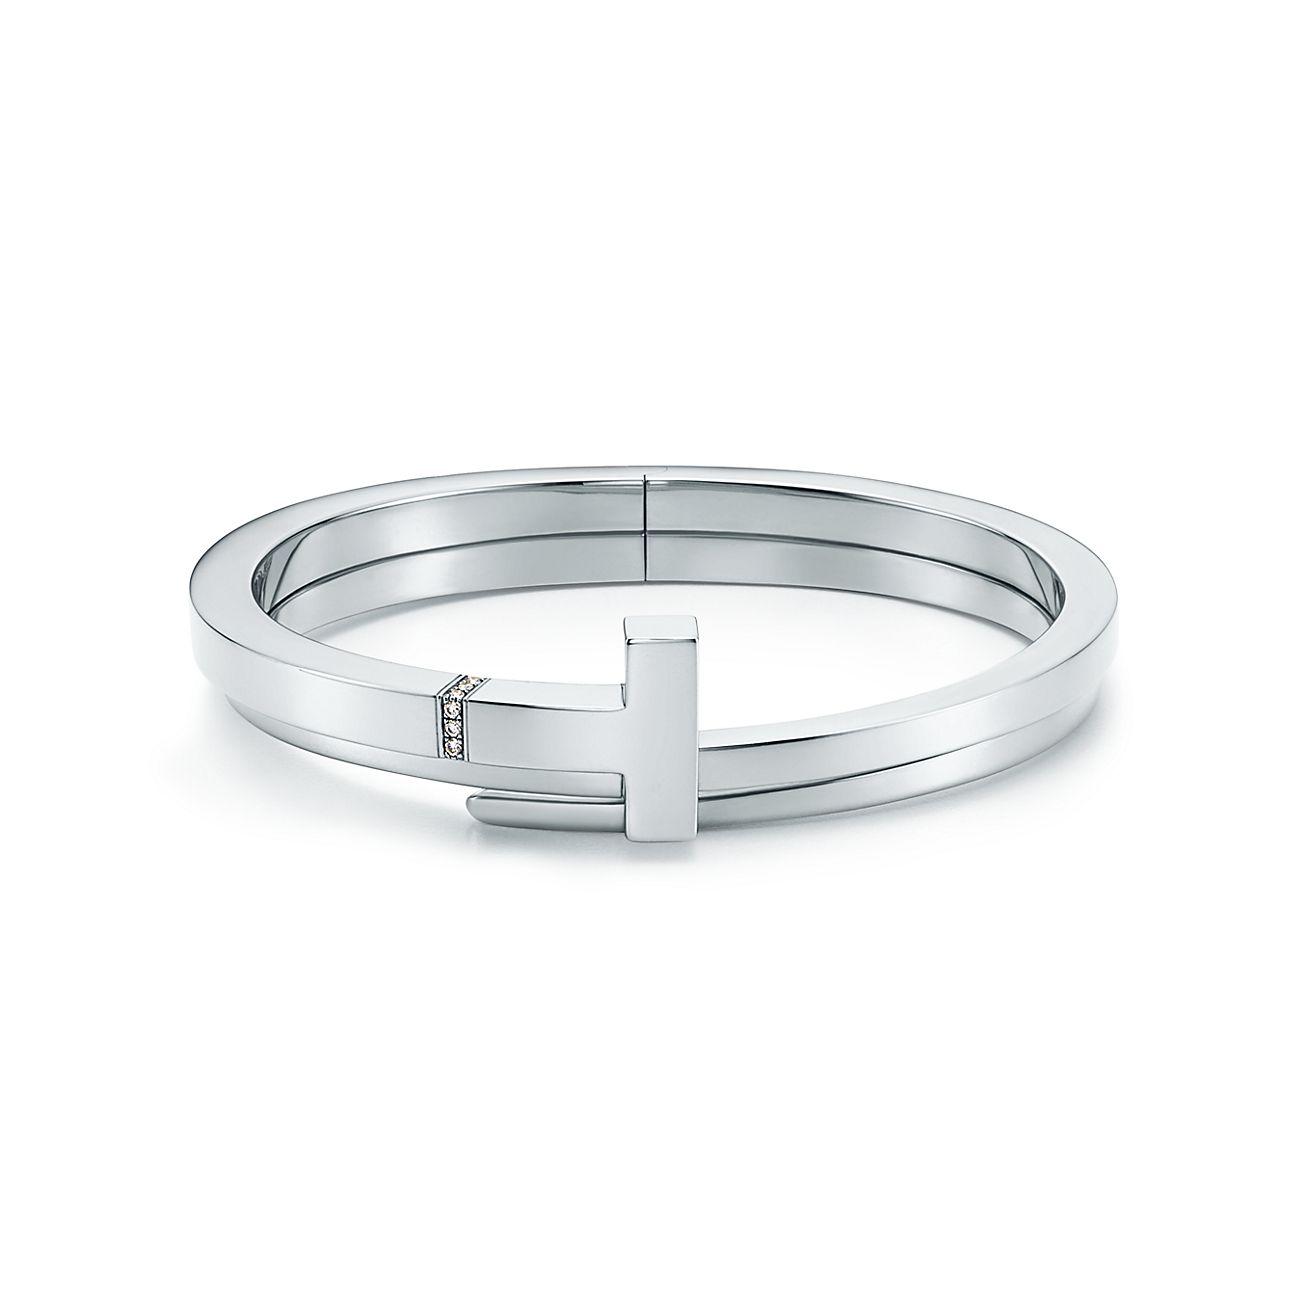 Tiffany T:hinged Wrap Bracelet